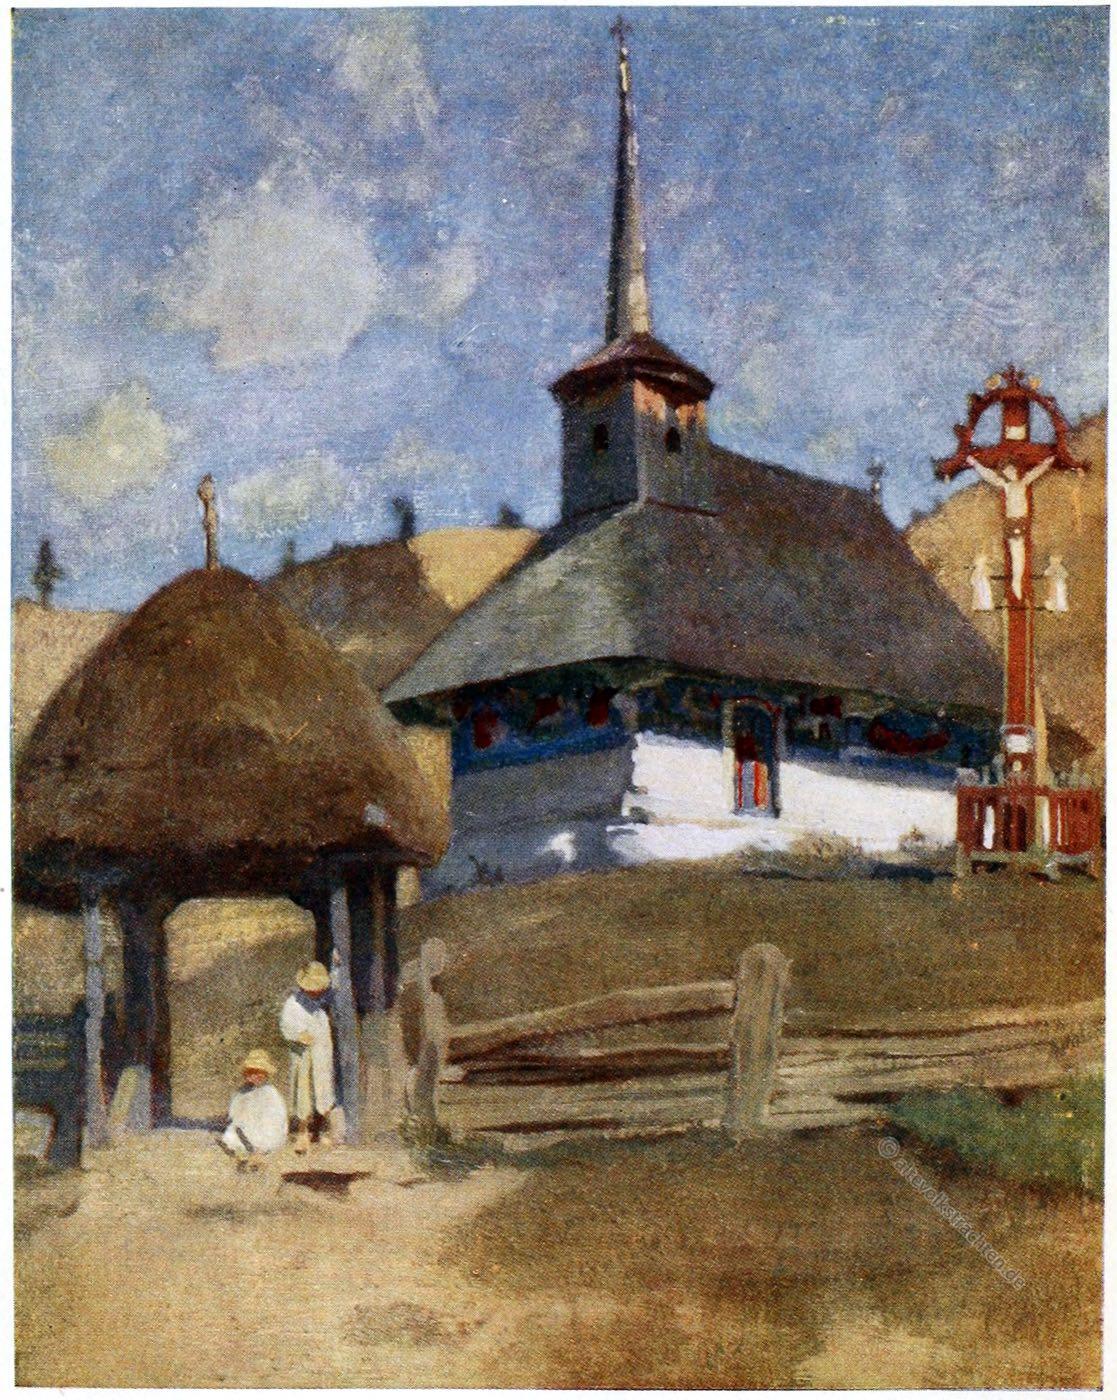 Adrian Scott Stokes, Deseşti, Kirche, Siebenbürgen, Transylvanien, Rumänien, Church, Romania